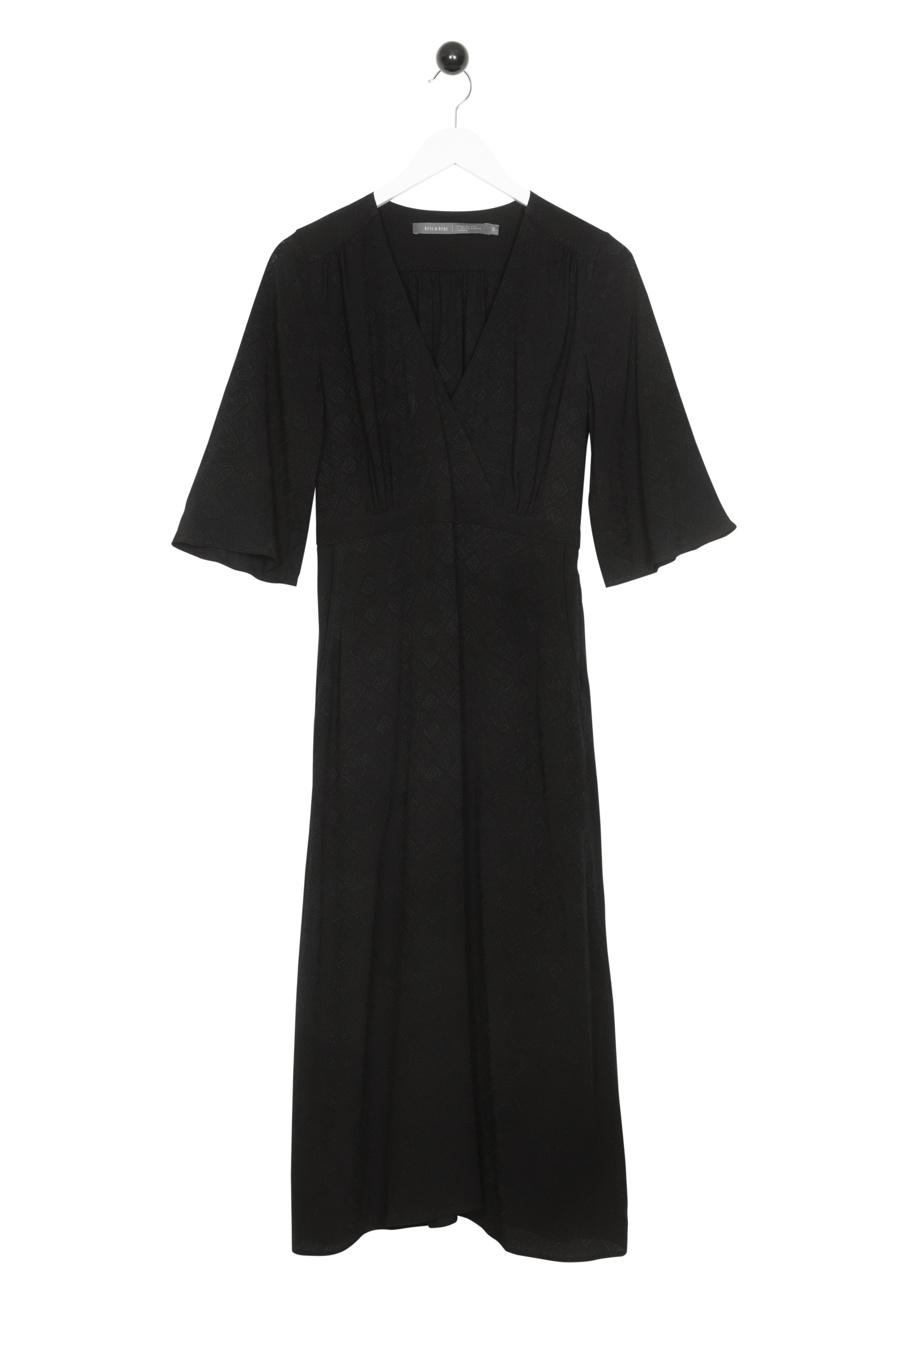 Löderup Dress